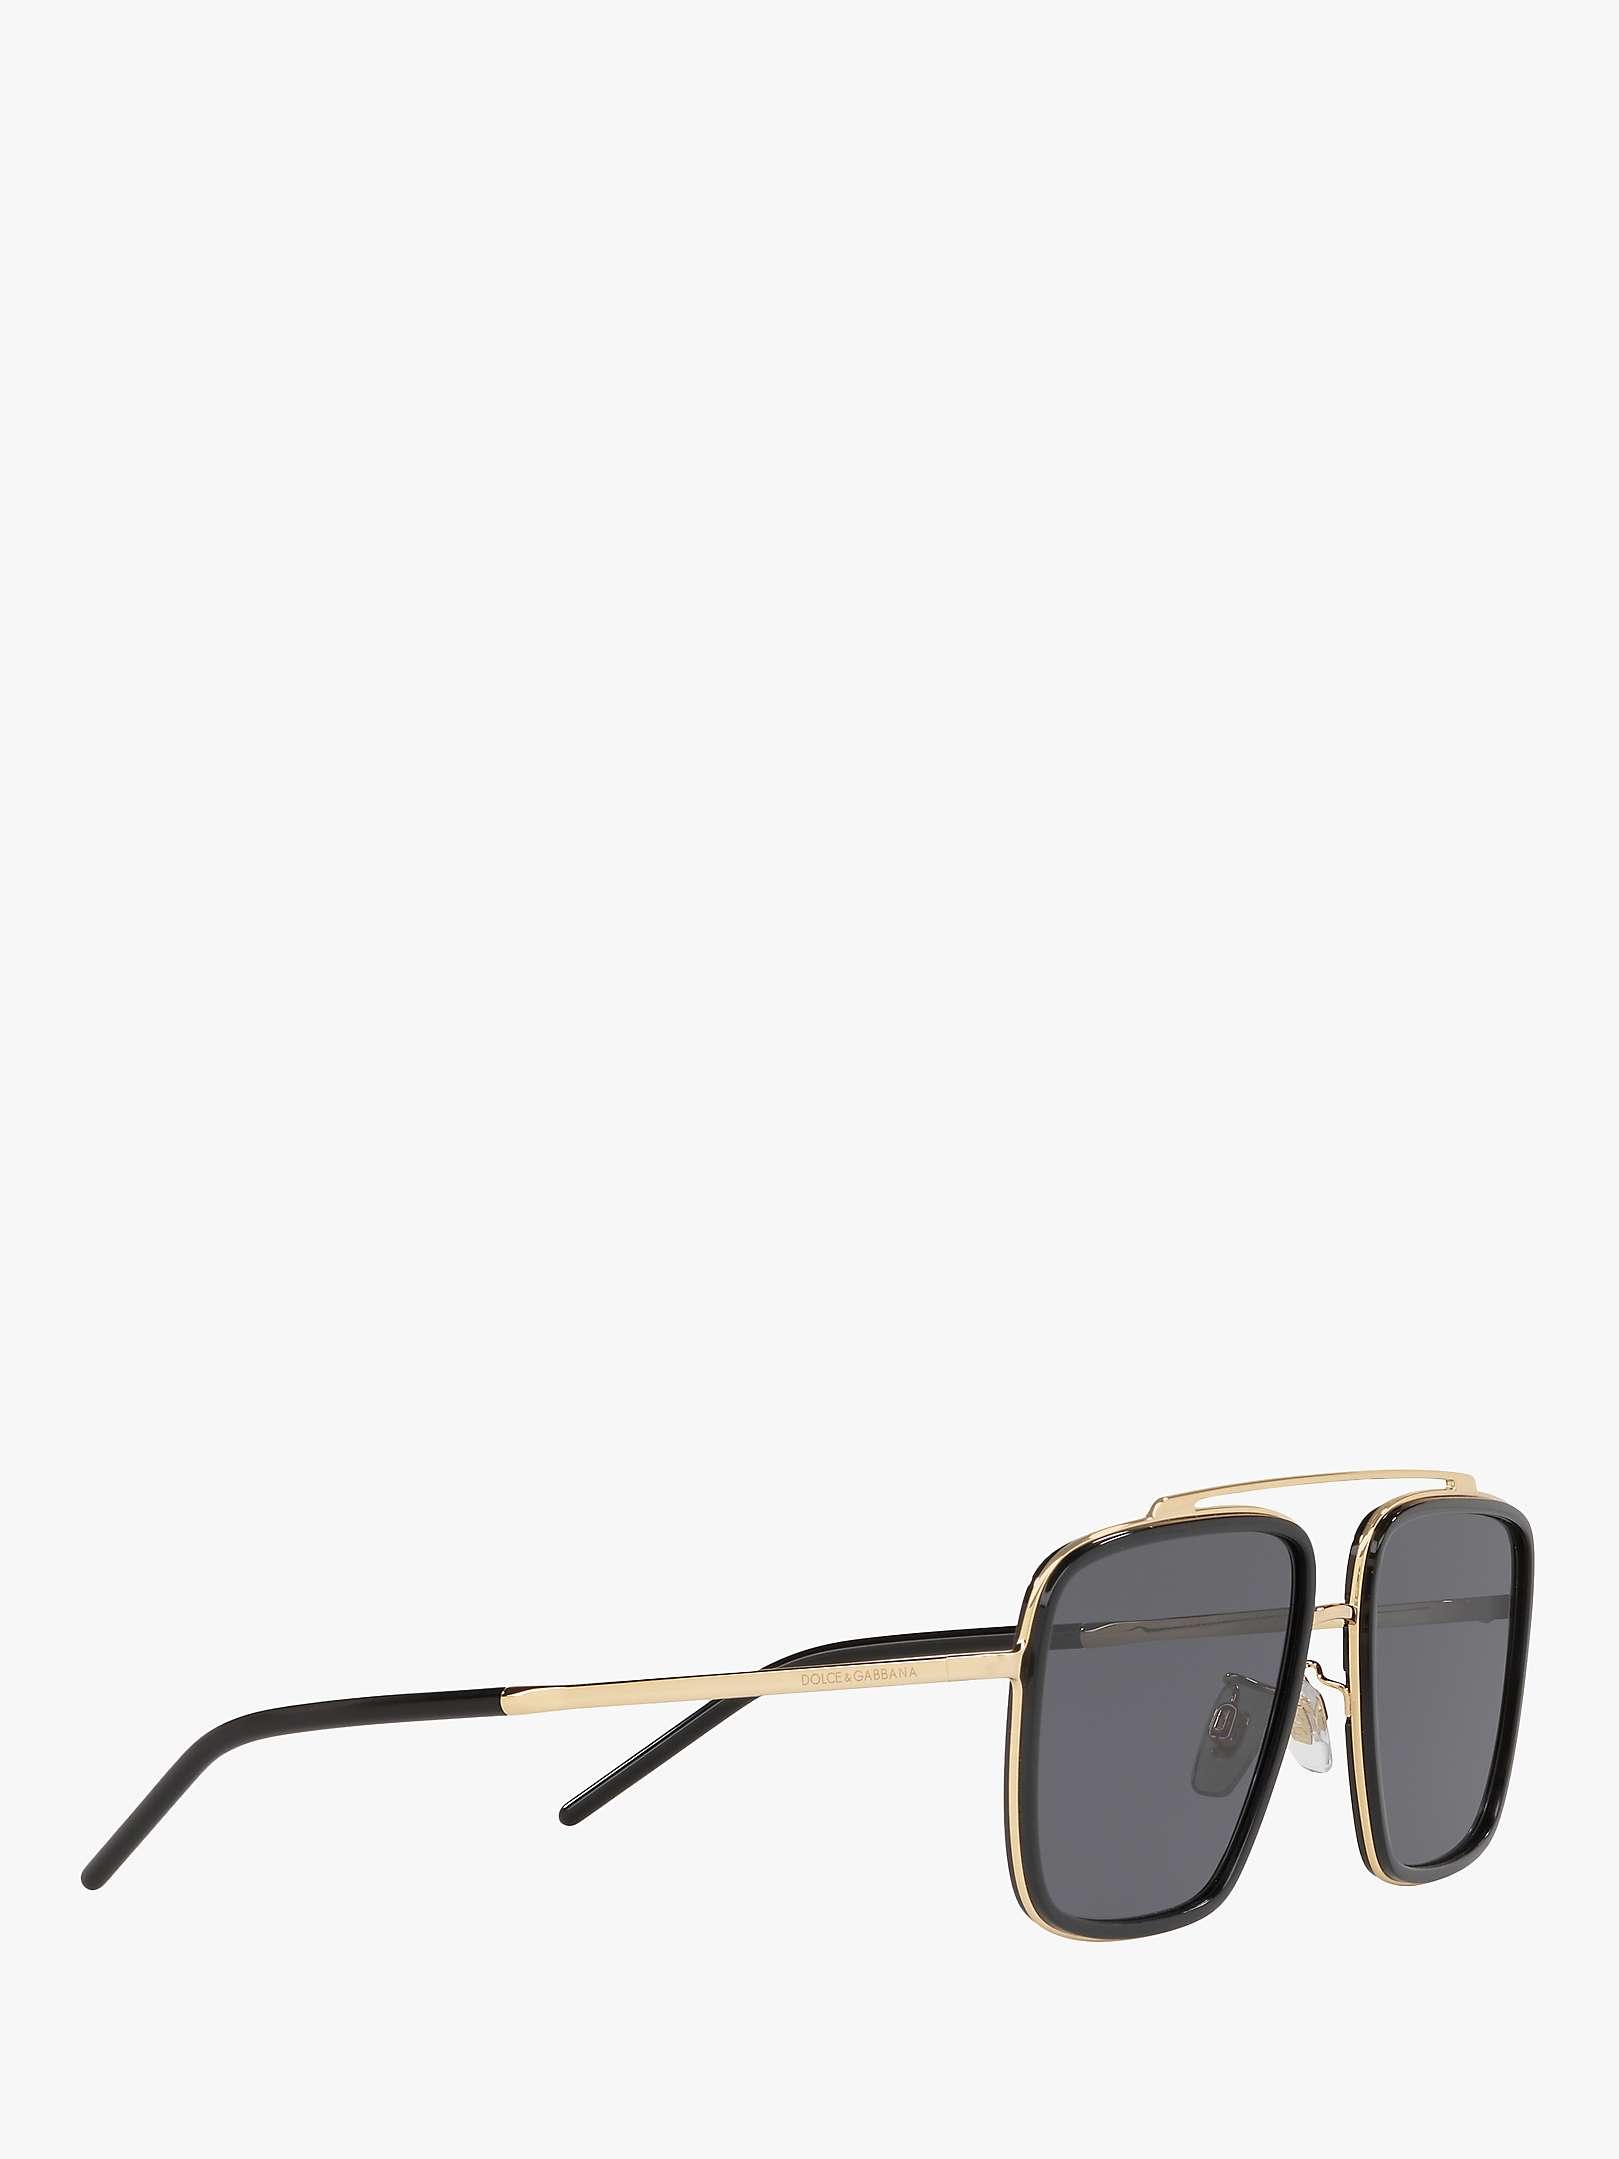 Dolce & Gabbana DG2220 Men's Polarised Square Sunglasses, GoldBlack